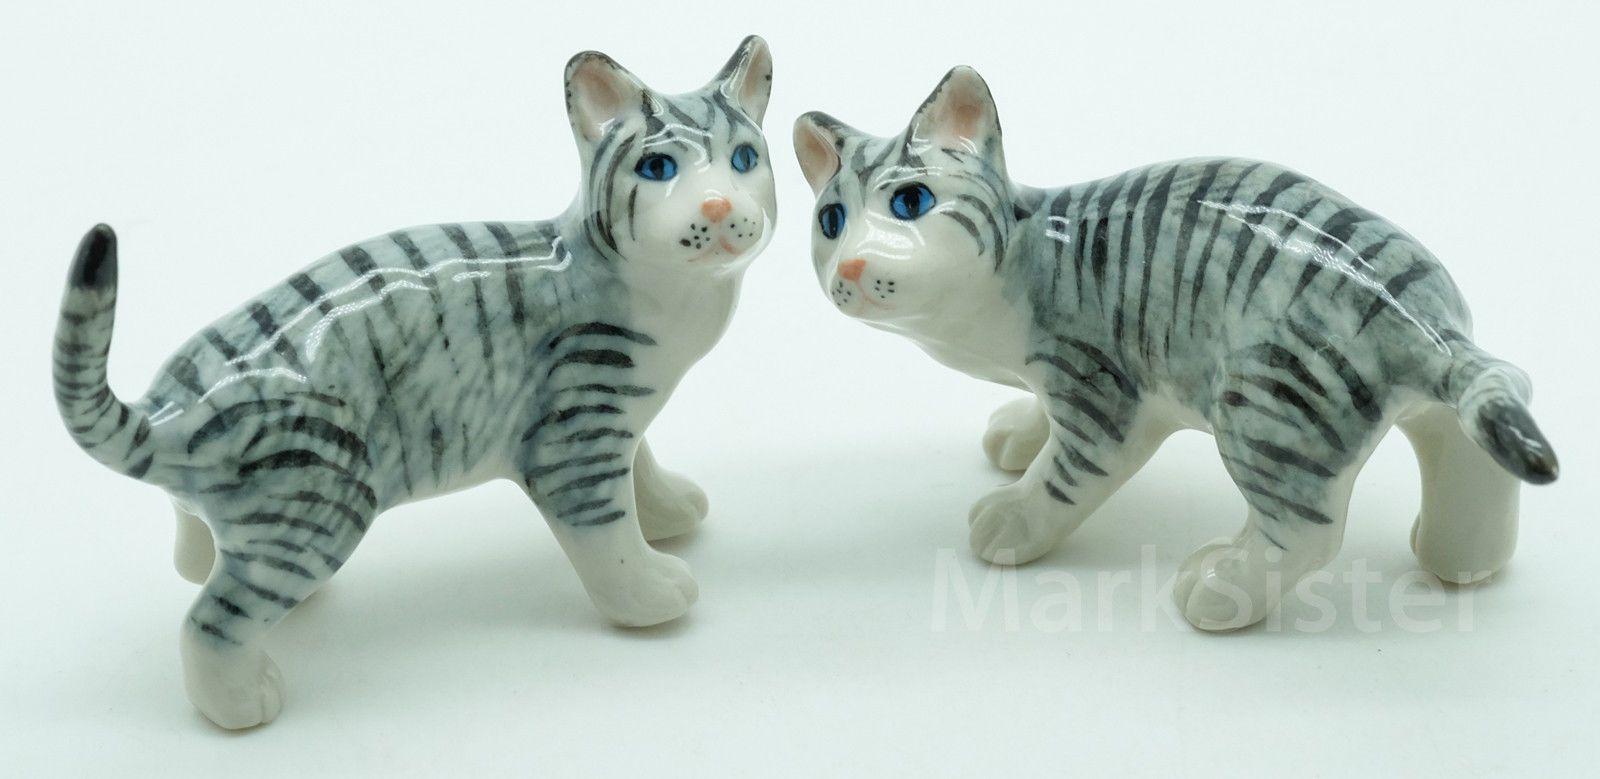 Details about Figurine Animal Miniature Ceramic Statue 2 Gray Cat Kitten…